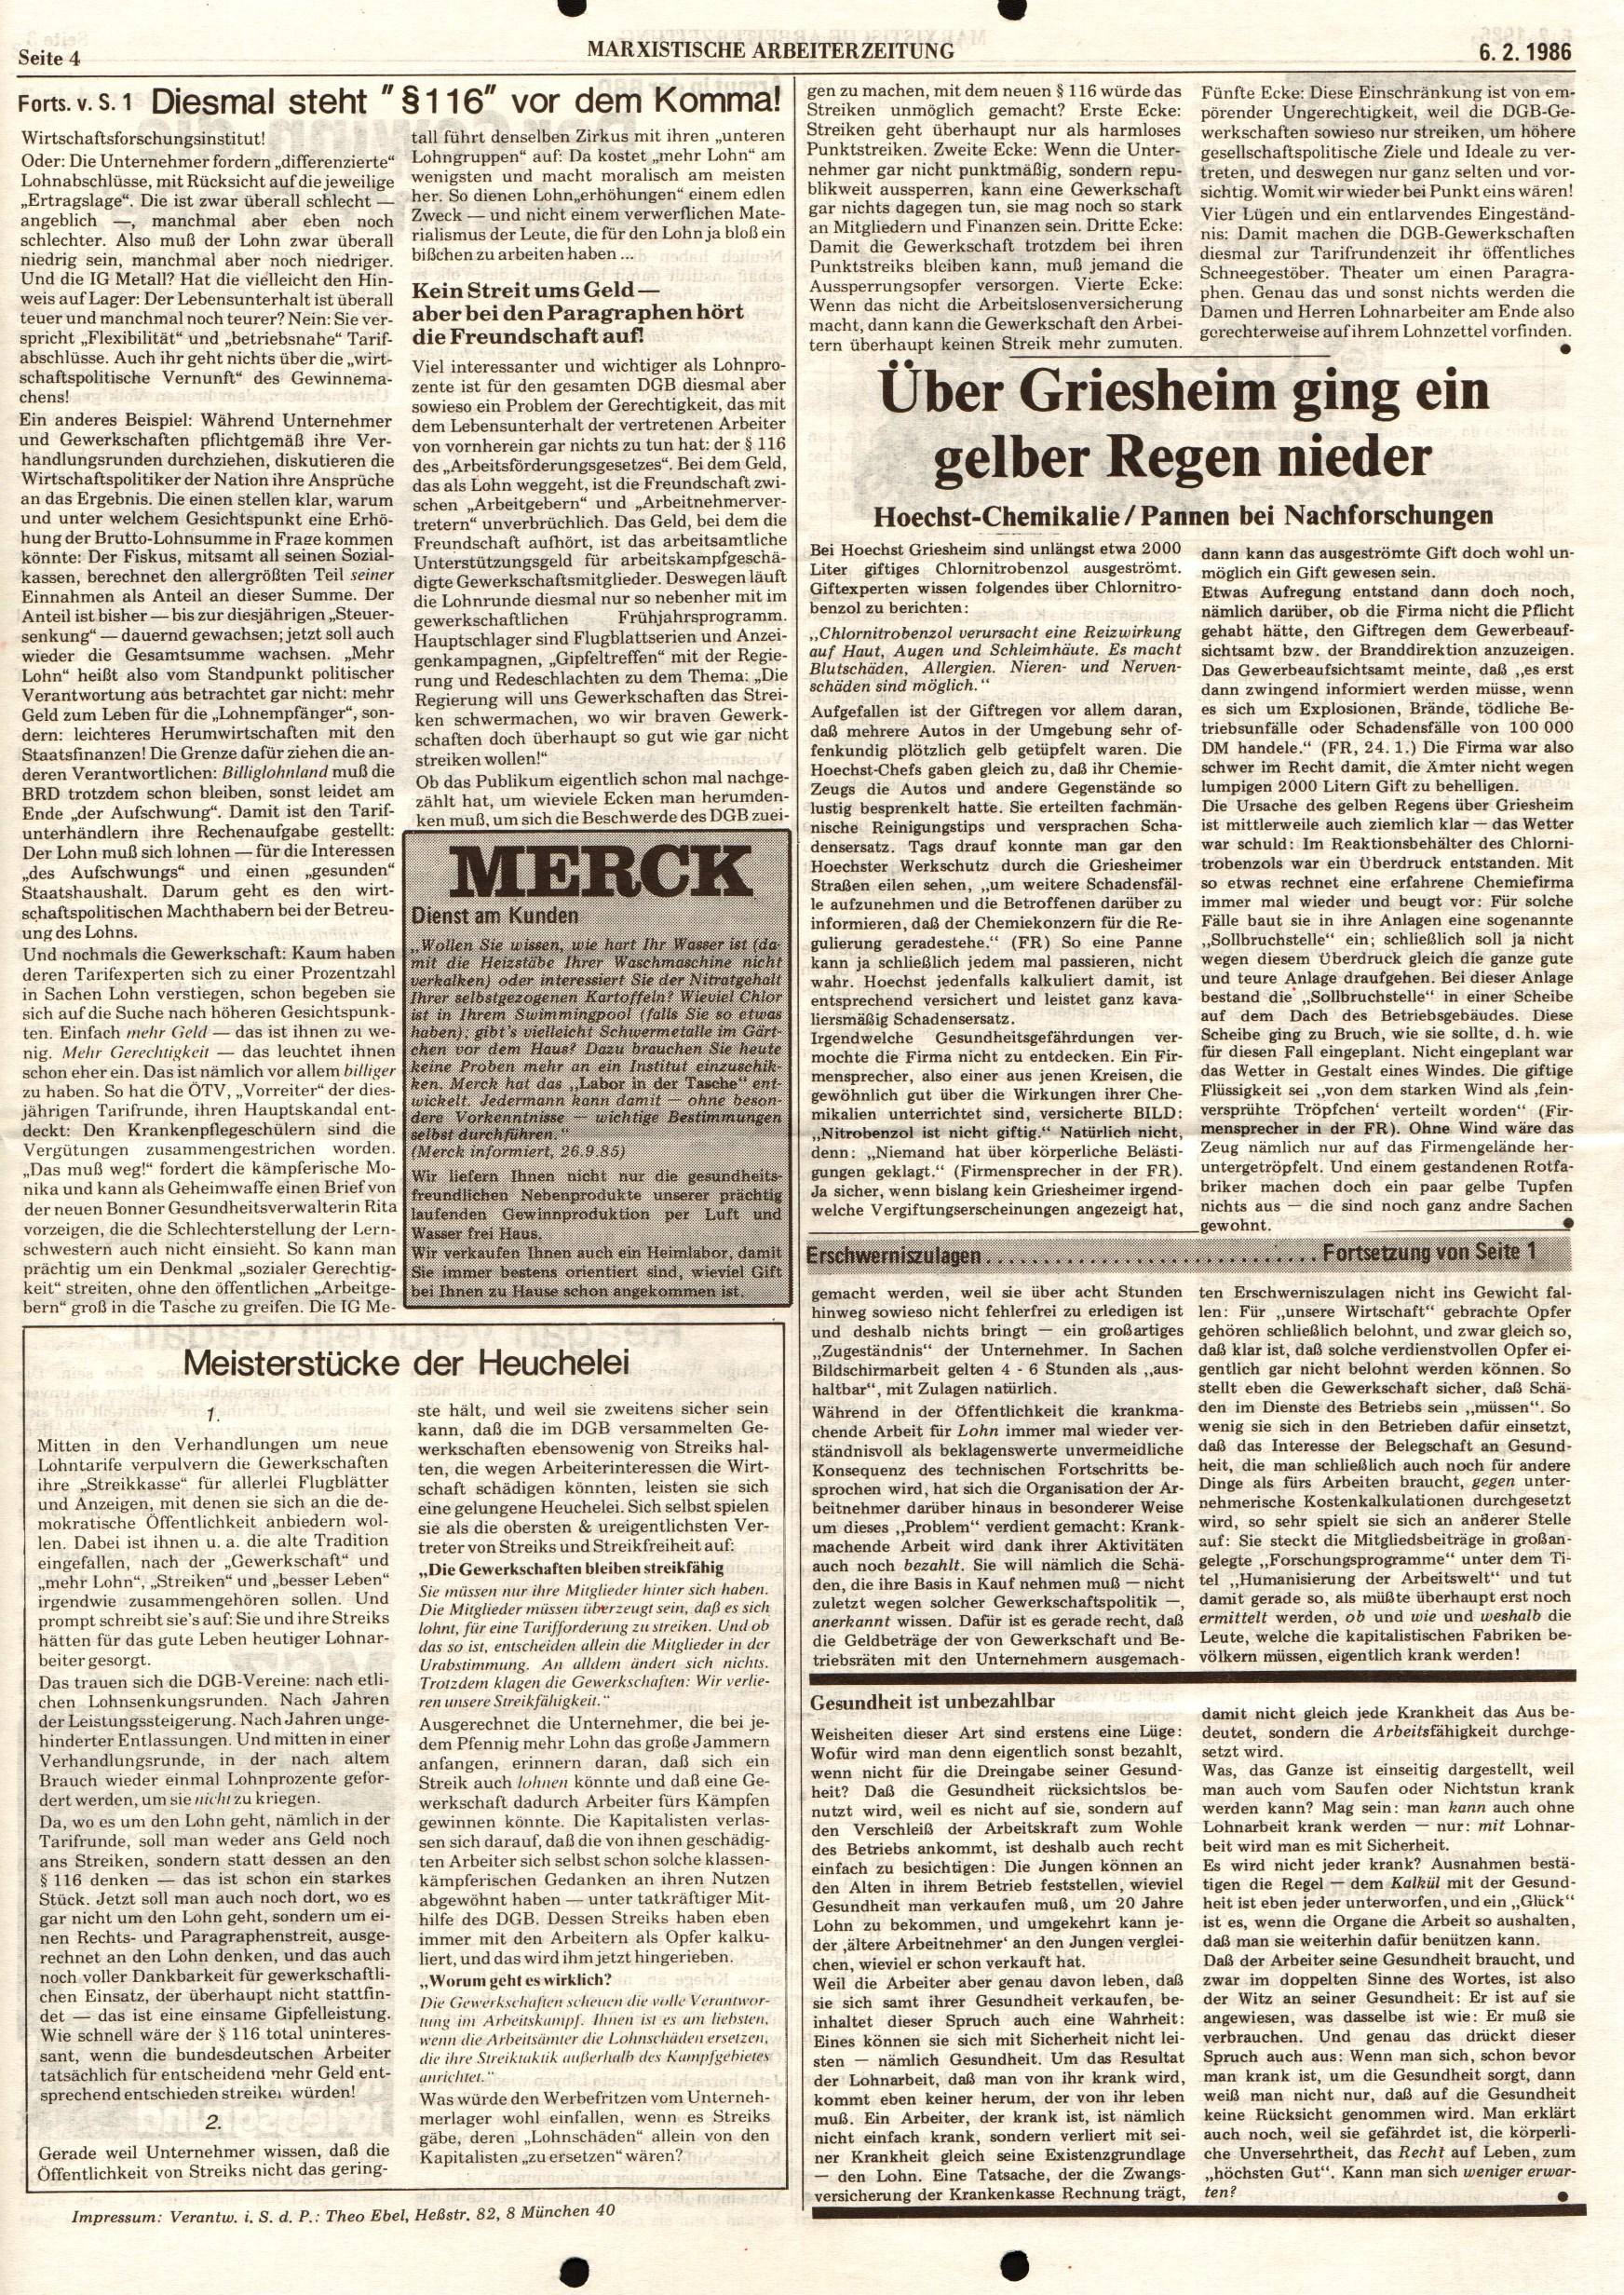 Frankfurt_CPK_Hoechst_MAZ362